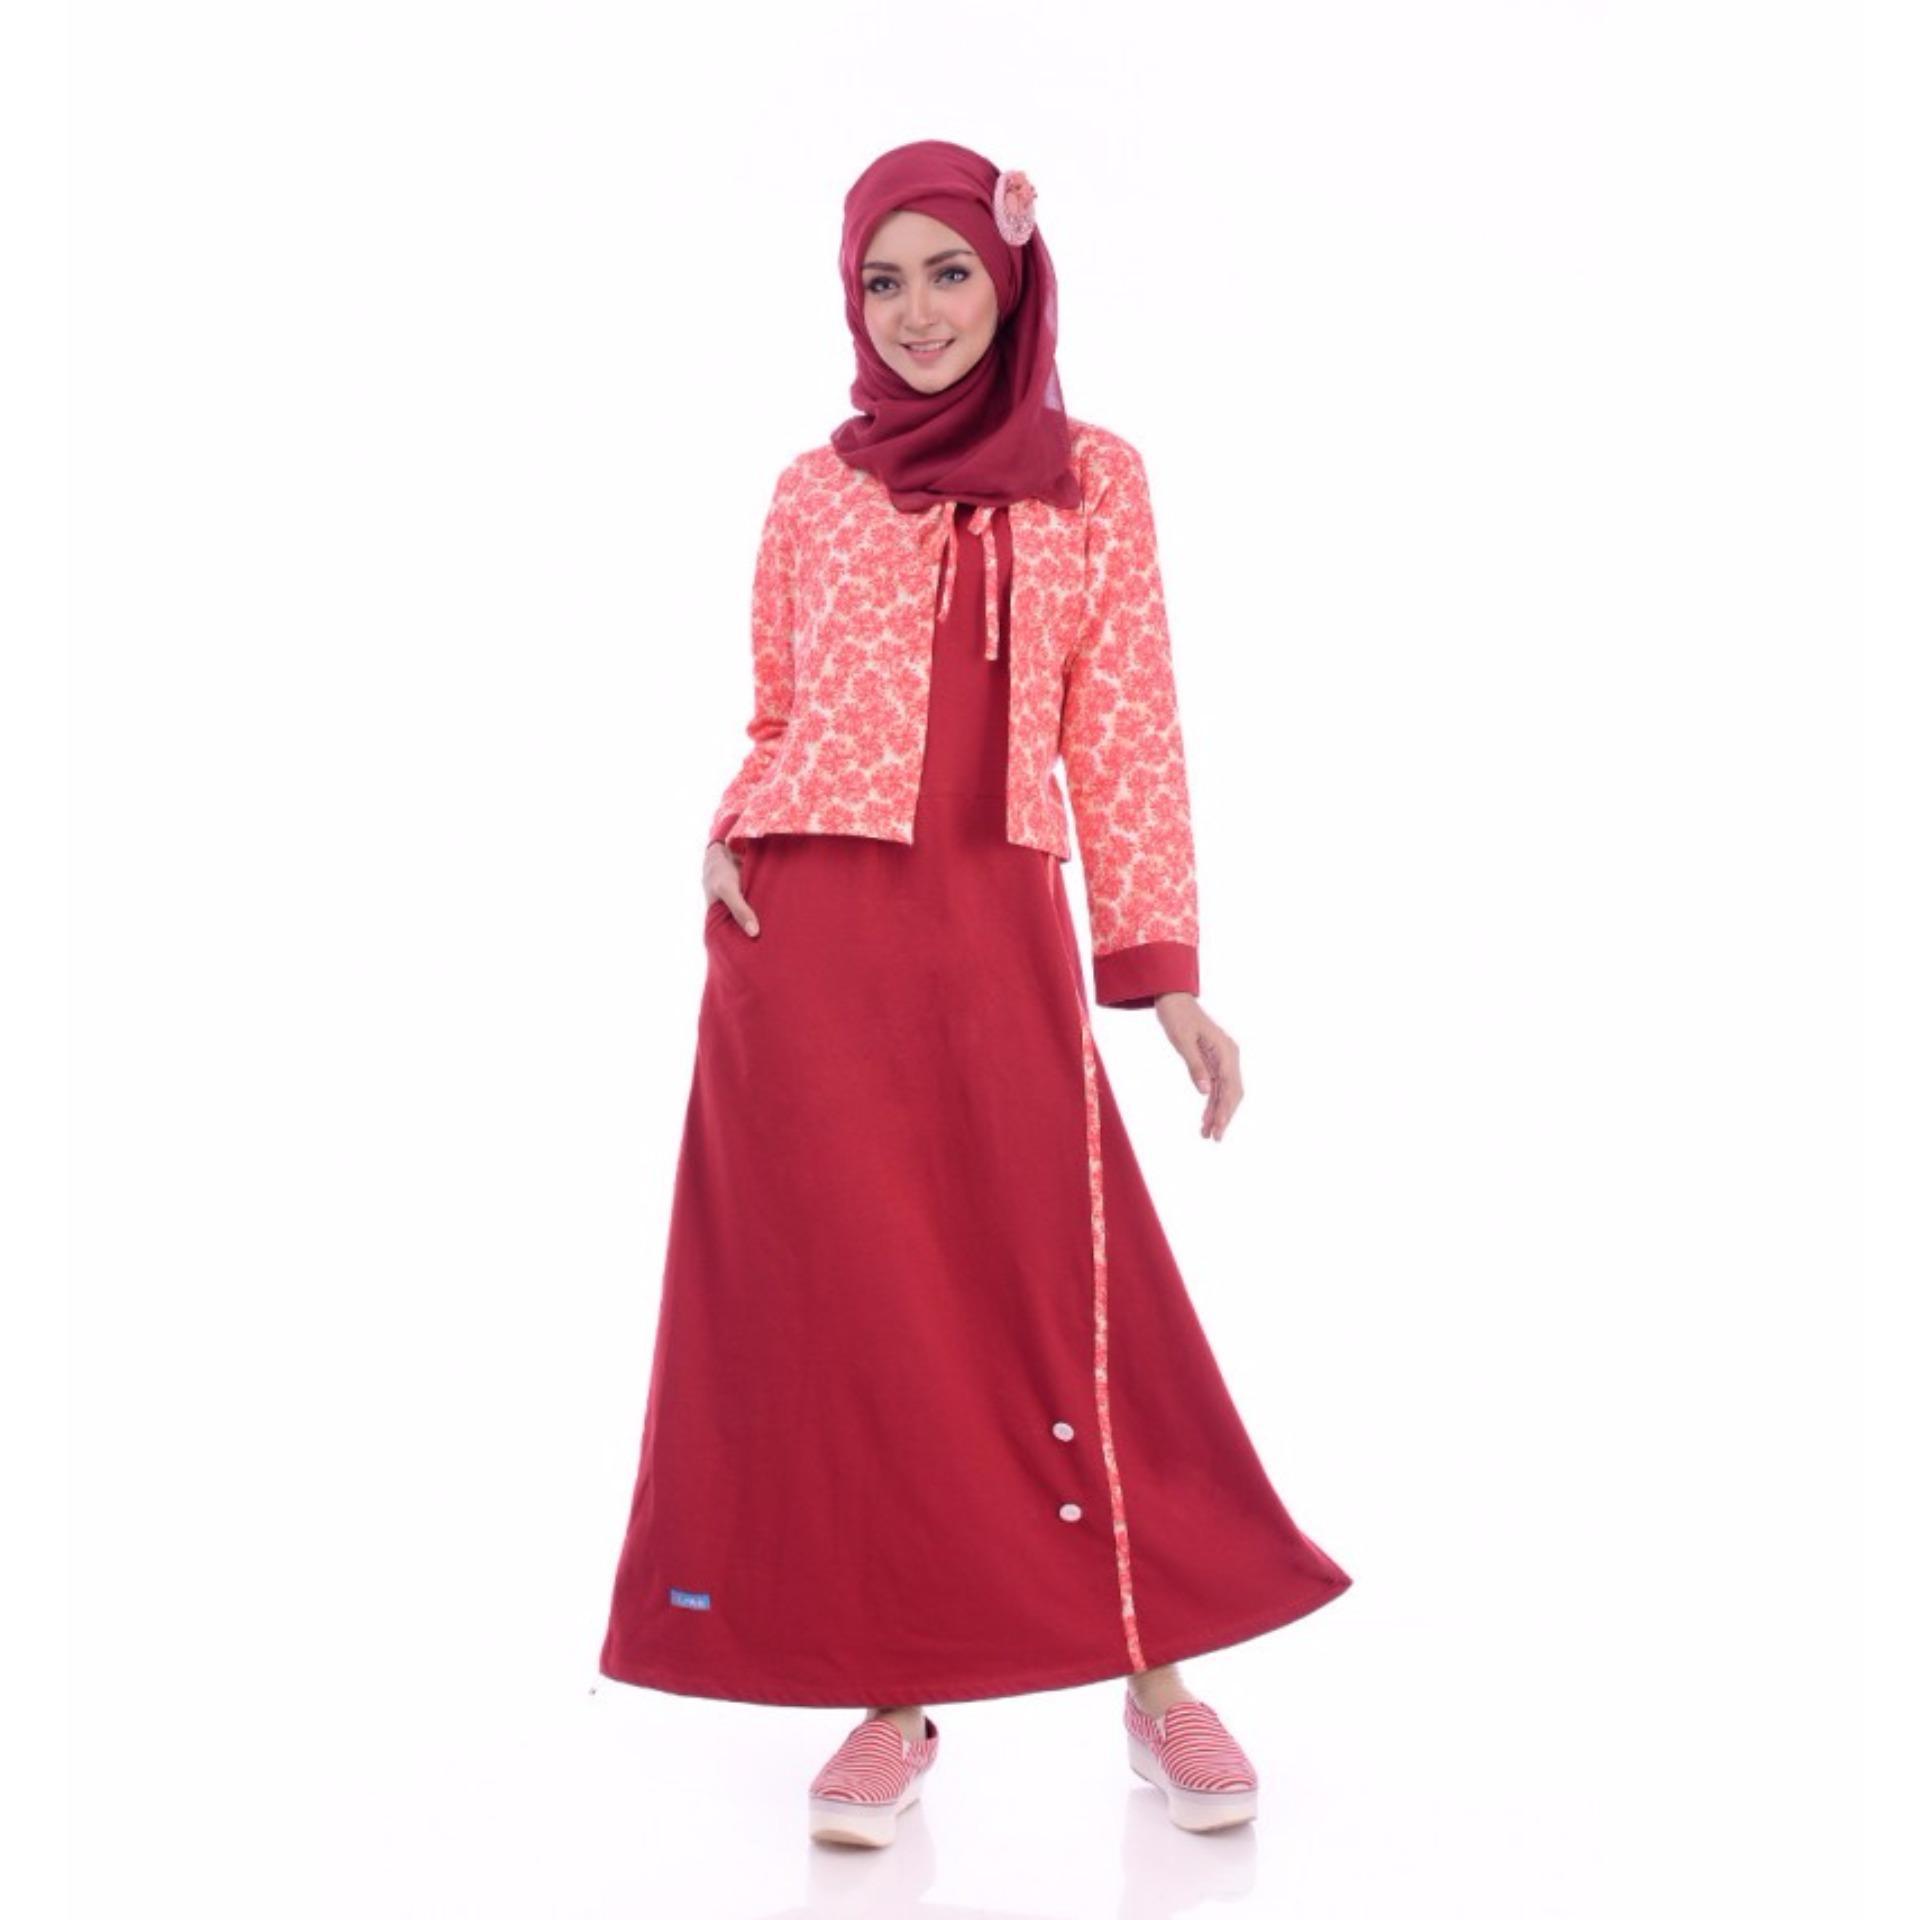 Alnita AG-18 Baju Muslim Baju Hijab Baju Muslim Modern Wanita Baju Muslim  Gamis Dress fe6889ec38